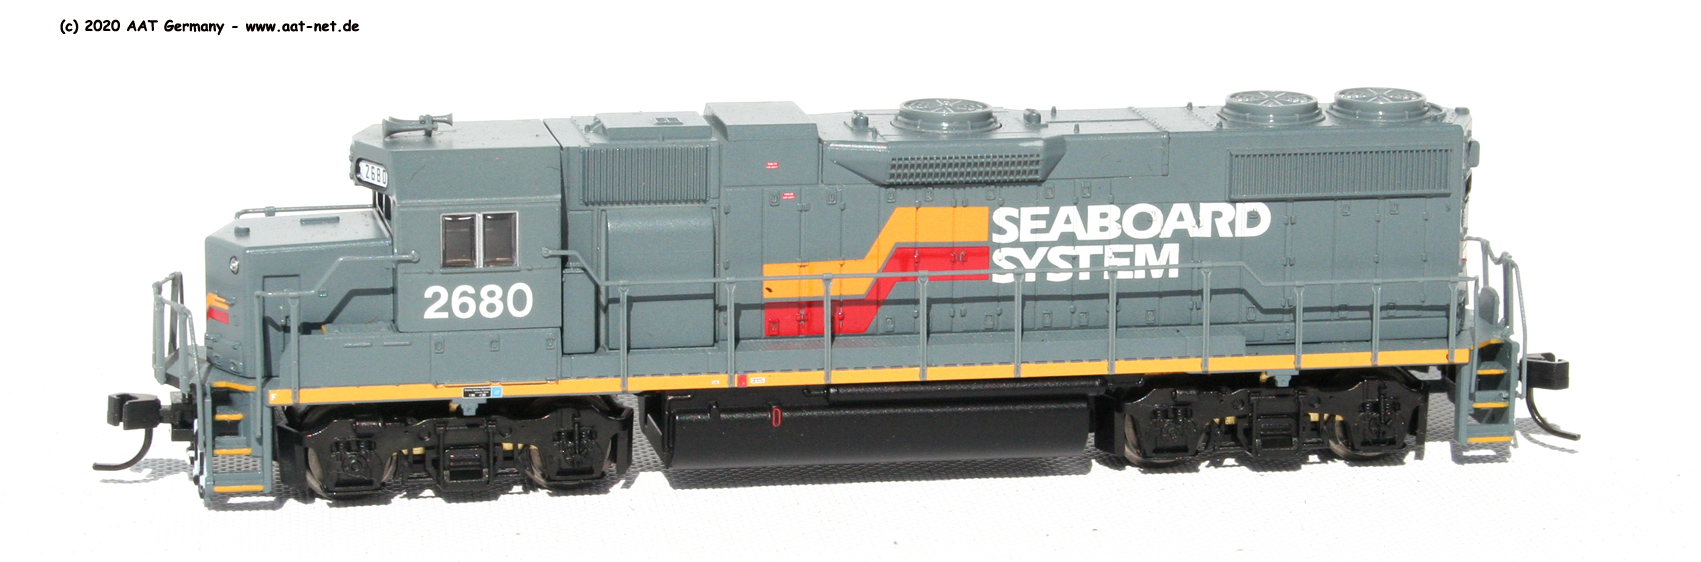 Seabord System